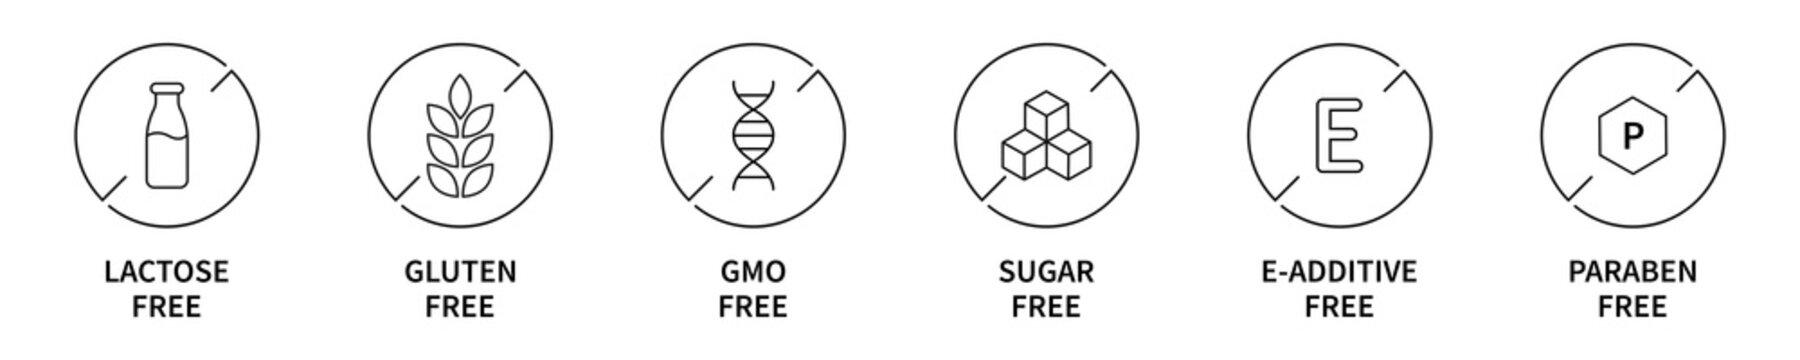 Gluten gmo lactose paraben sugar e-additive free icon set. Vector allergy free product symbol collection.